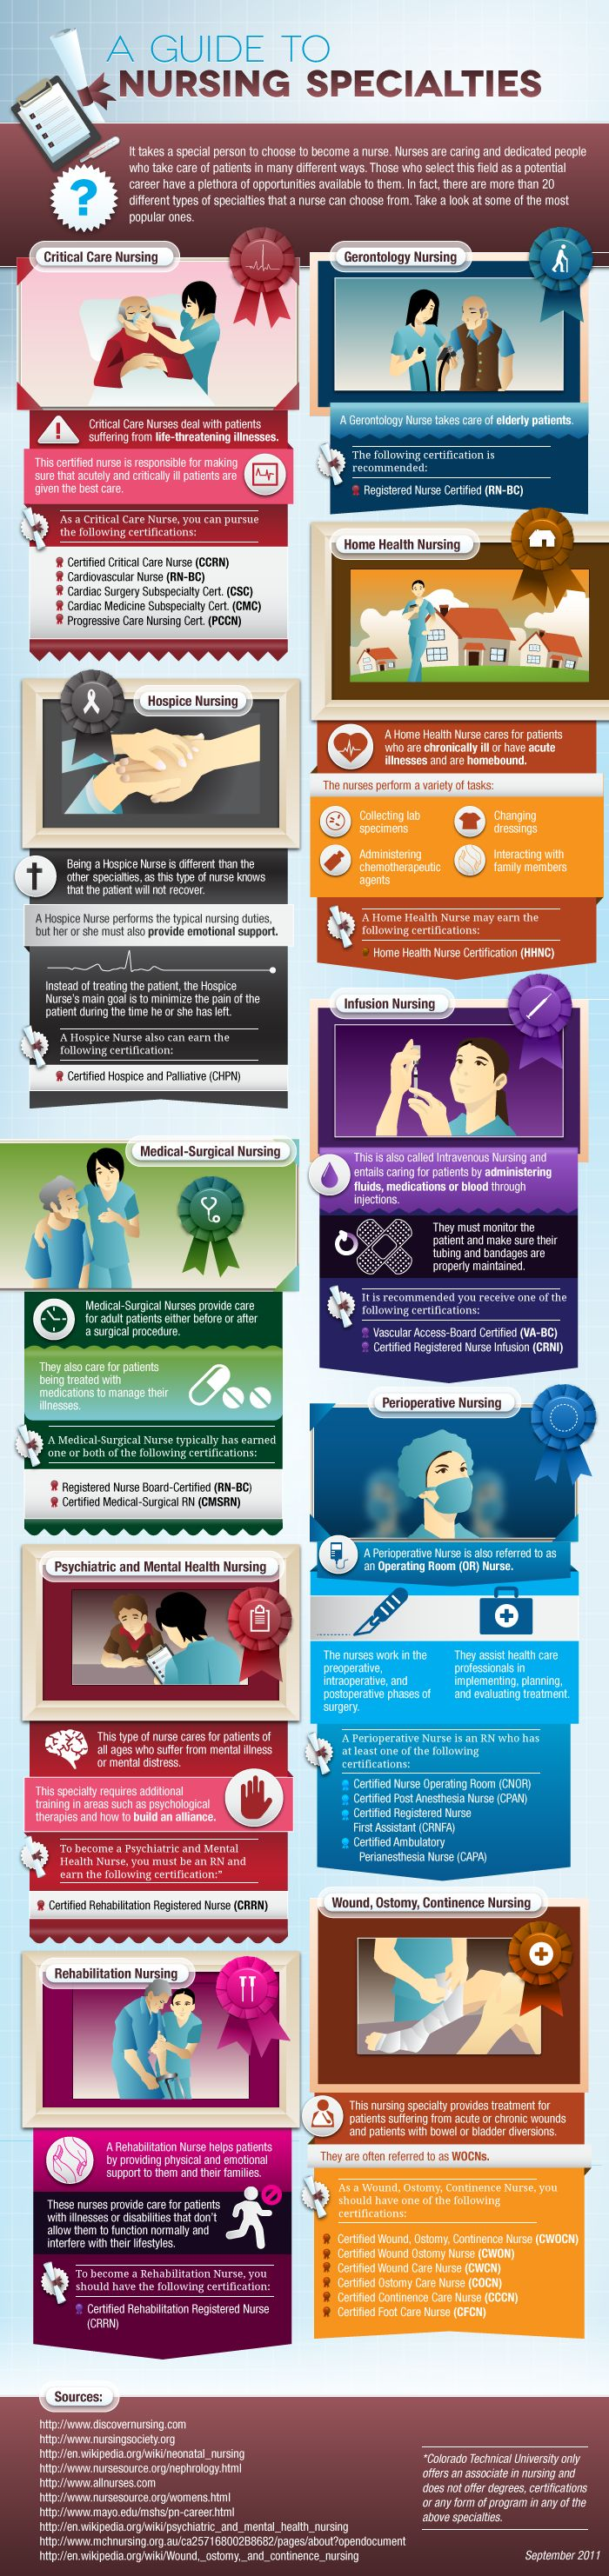 Superb Guide To Nursing Specialties Infographic